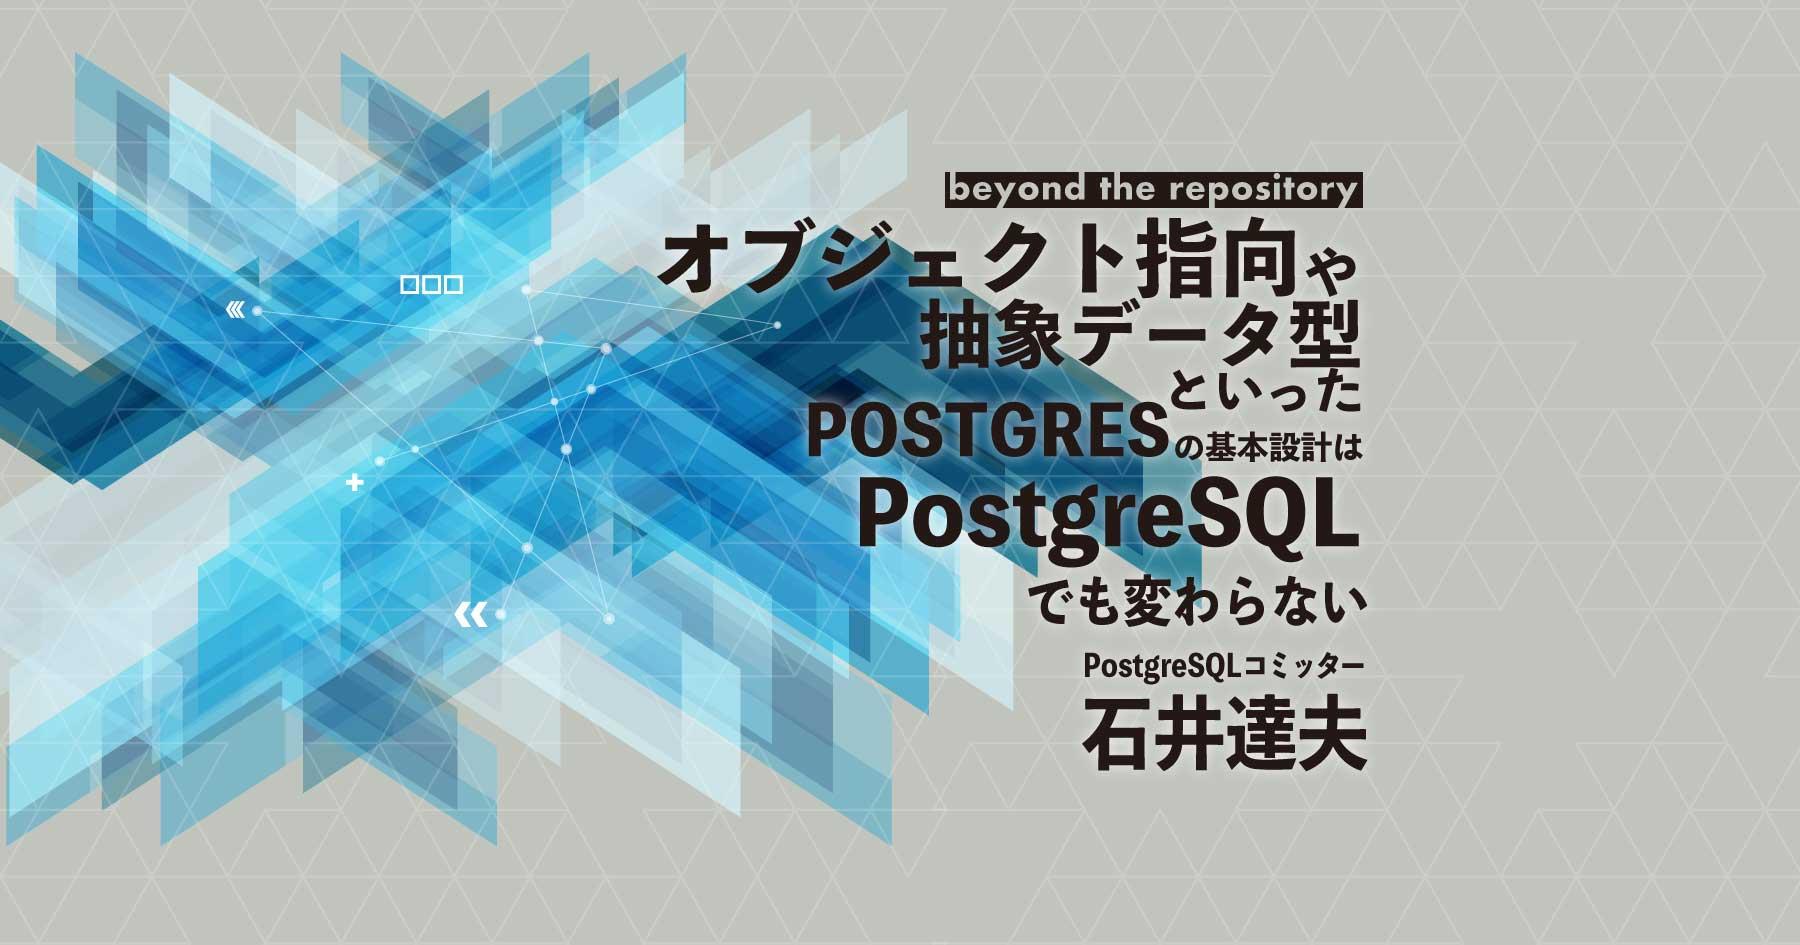 PostgreSQL石井達夫さんメインカット